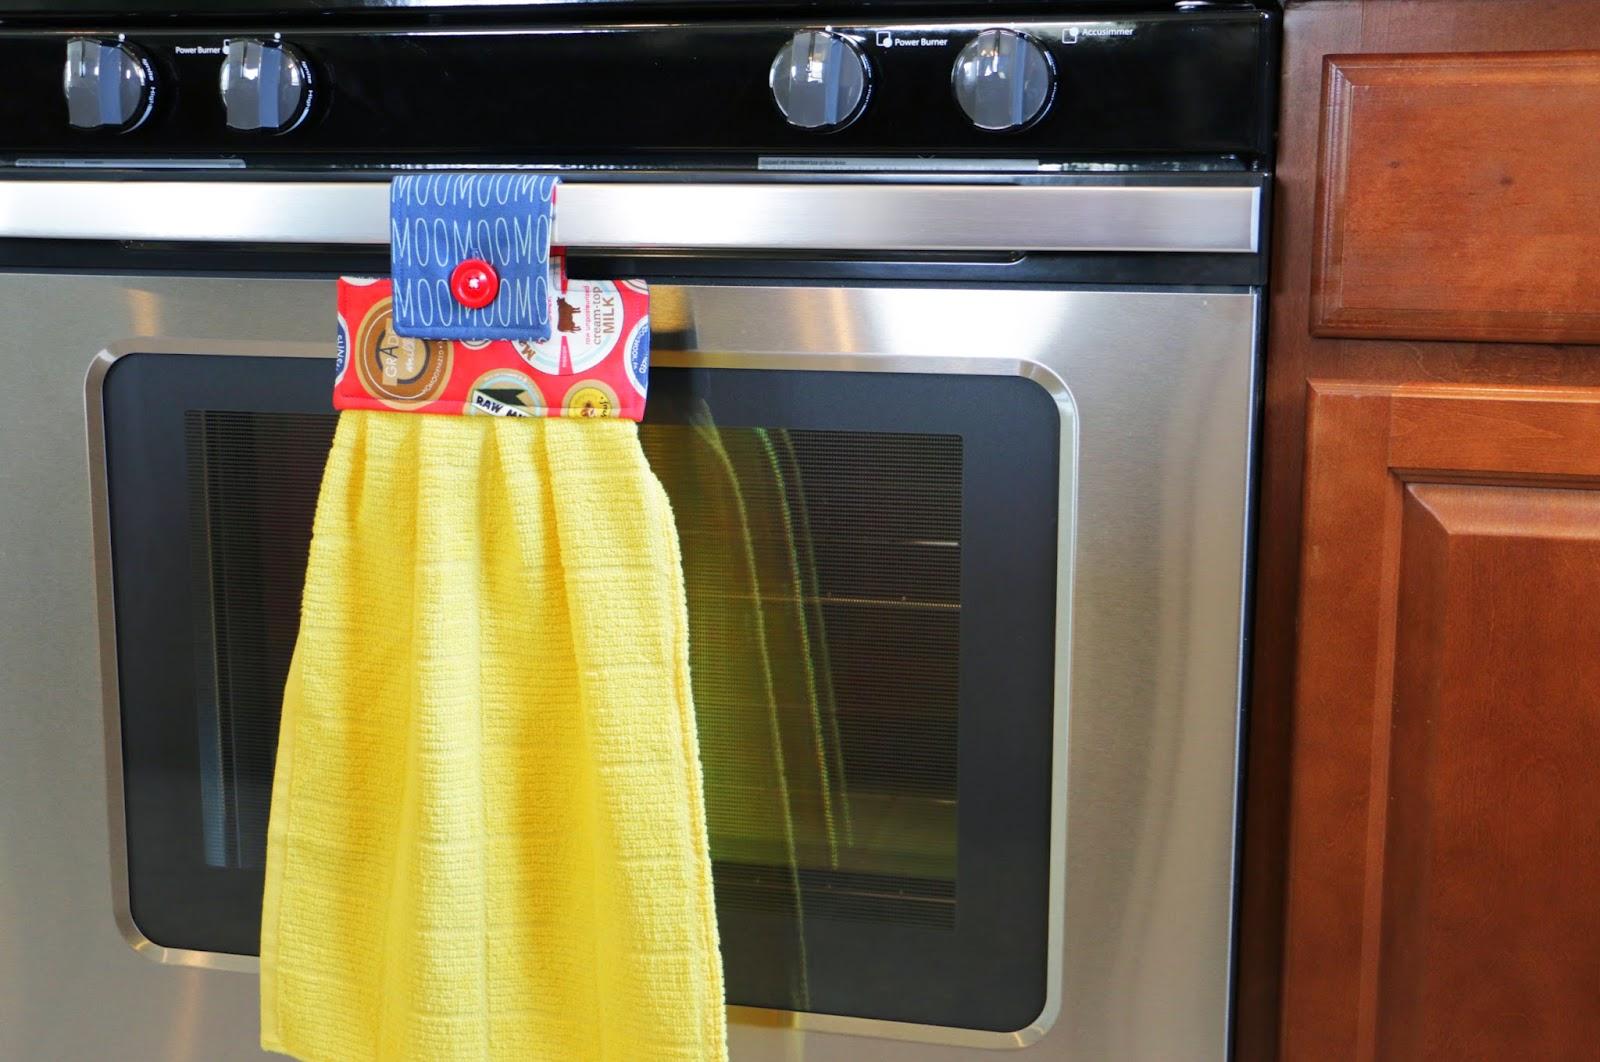 Kitchen Towel Hanging Milk Cow Kitchen Towel Fat Quarter Shops Jolly Jabber